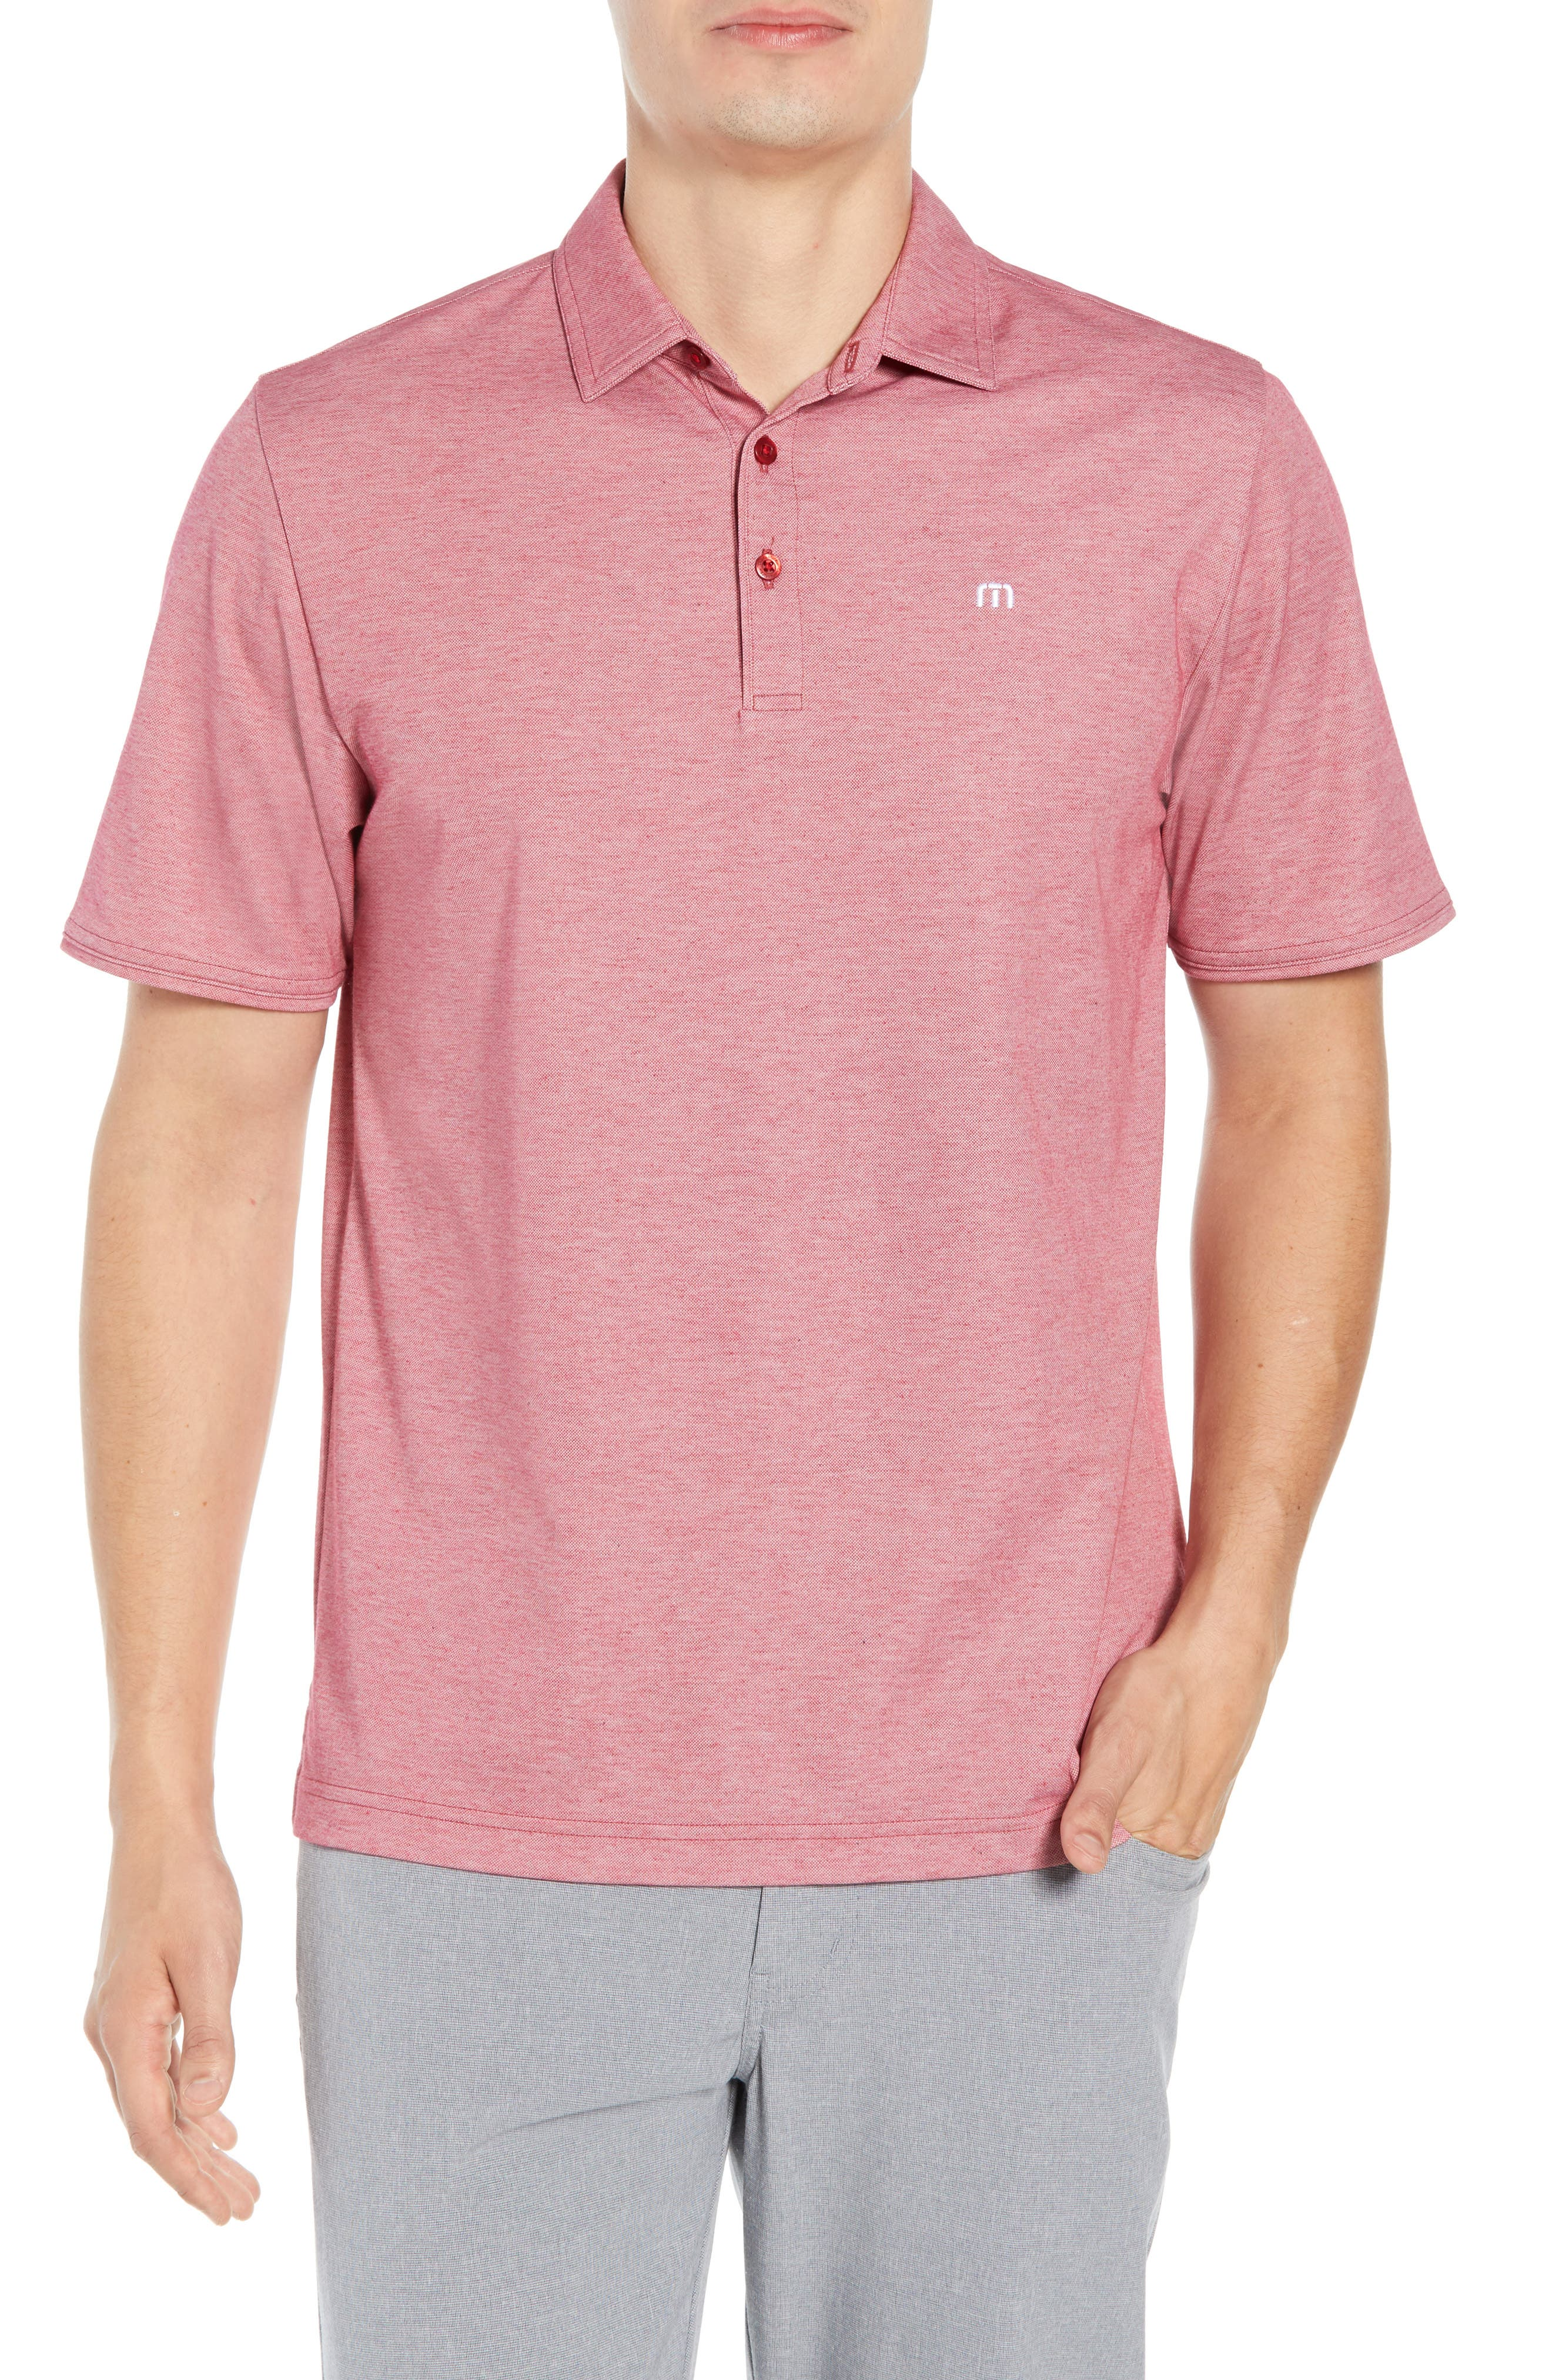 Image of TravisMathew Classy Regular Fit Jersey Polo